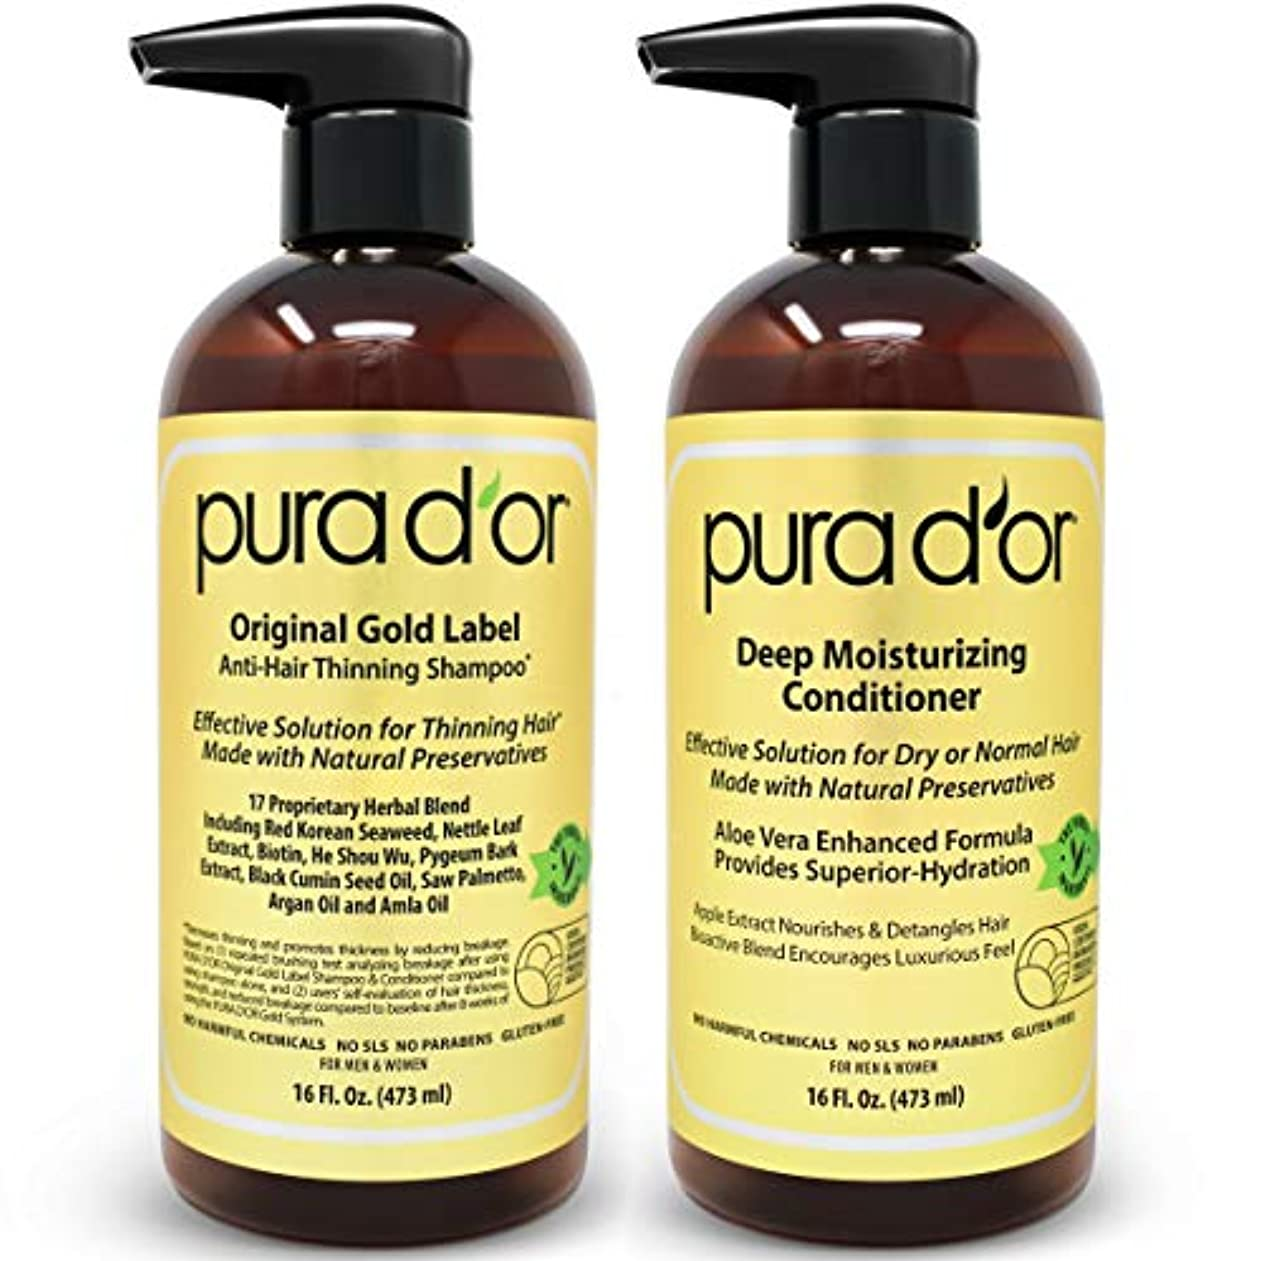 PURA D'OR オリジナル ゴールド ラベル 薄毛予防用 -臨床実験済み -アルガンオイル、ビオチン、天然原料、硫酸系化合物不使用、全髪タイプに、男性&女性用(パッケージは異なる場合があります) シャンプー&コンディショナー